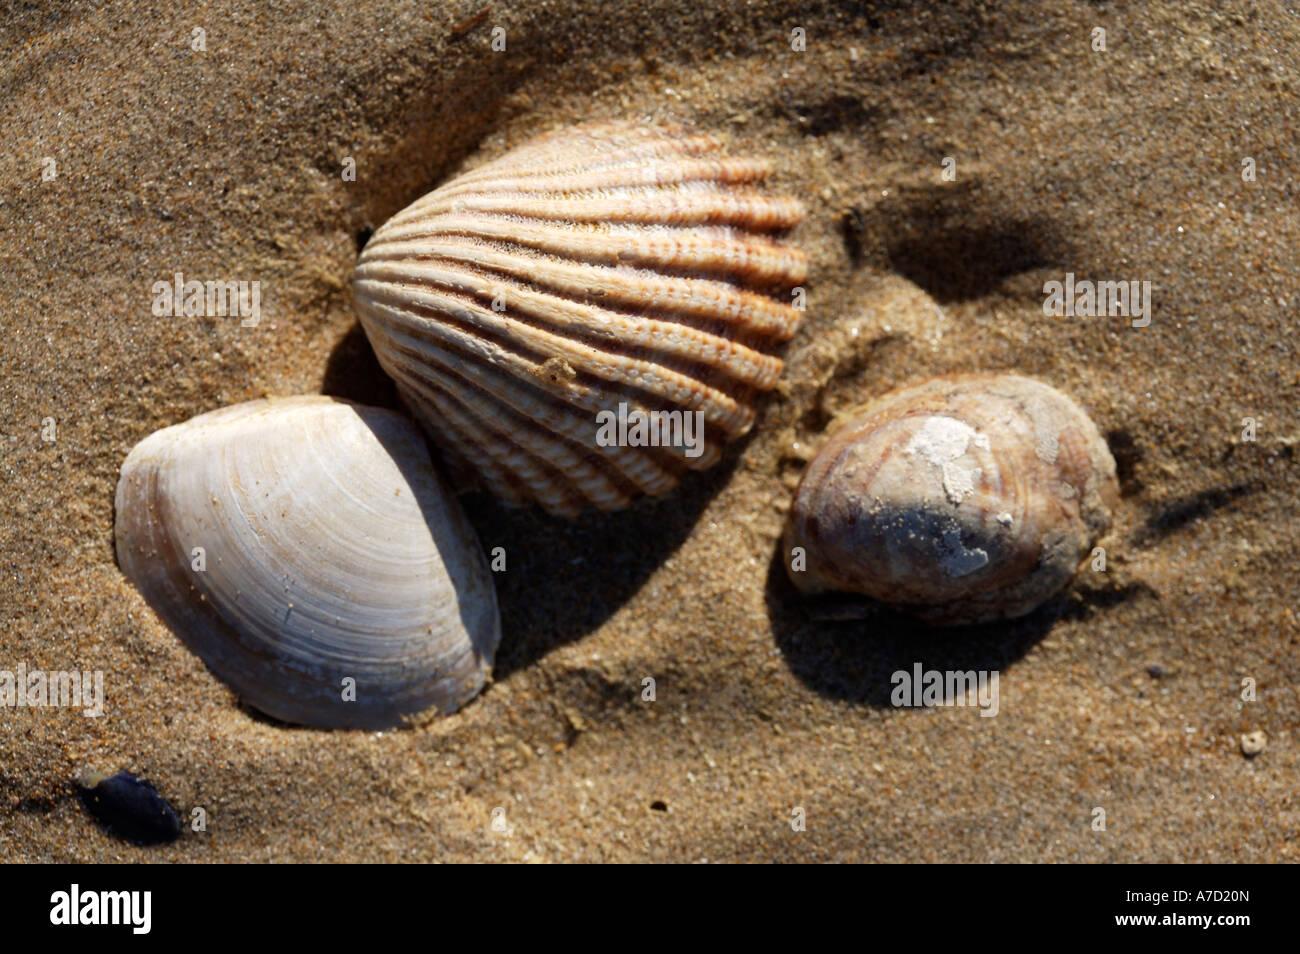 Beach Shells - Stock Image